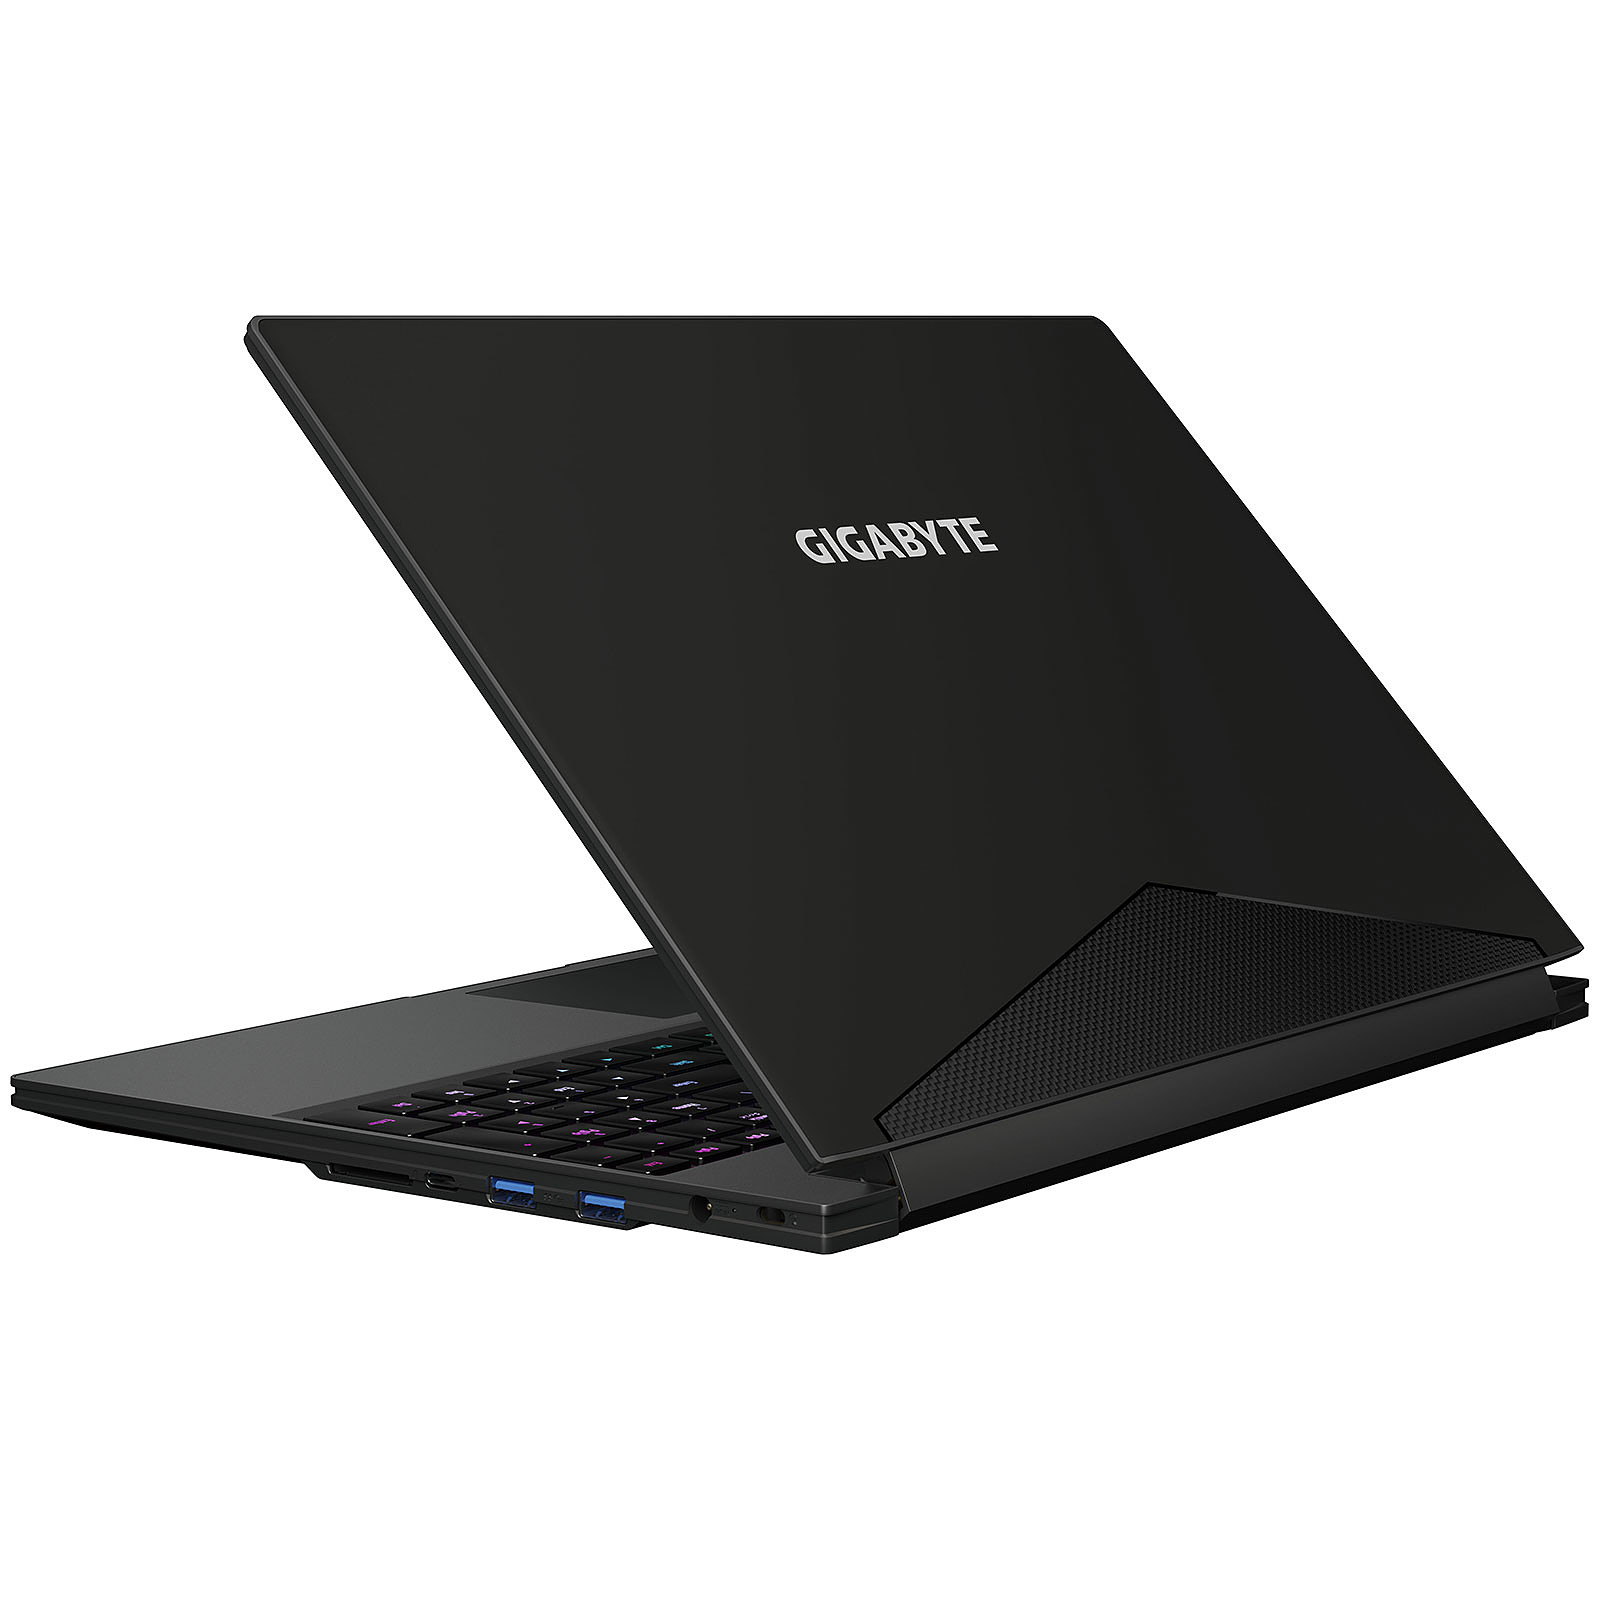 Gigabyte AERO15Classic-XA-7FR5250P - PC portable Gigabyte - 1